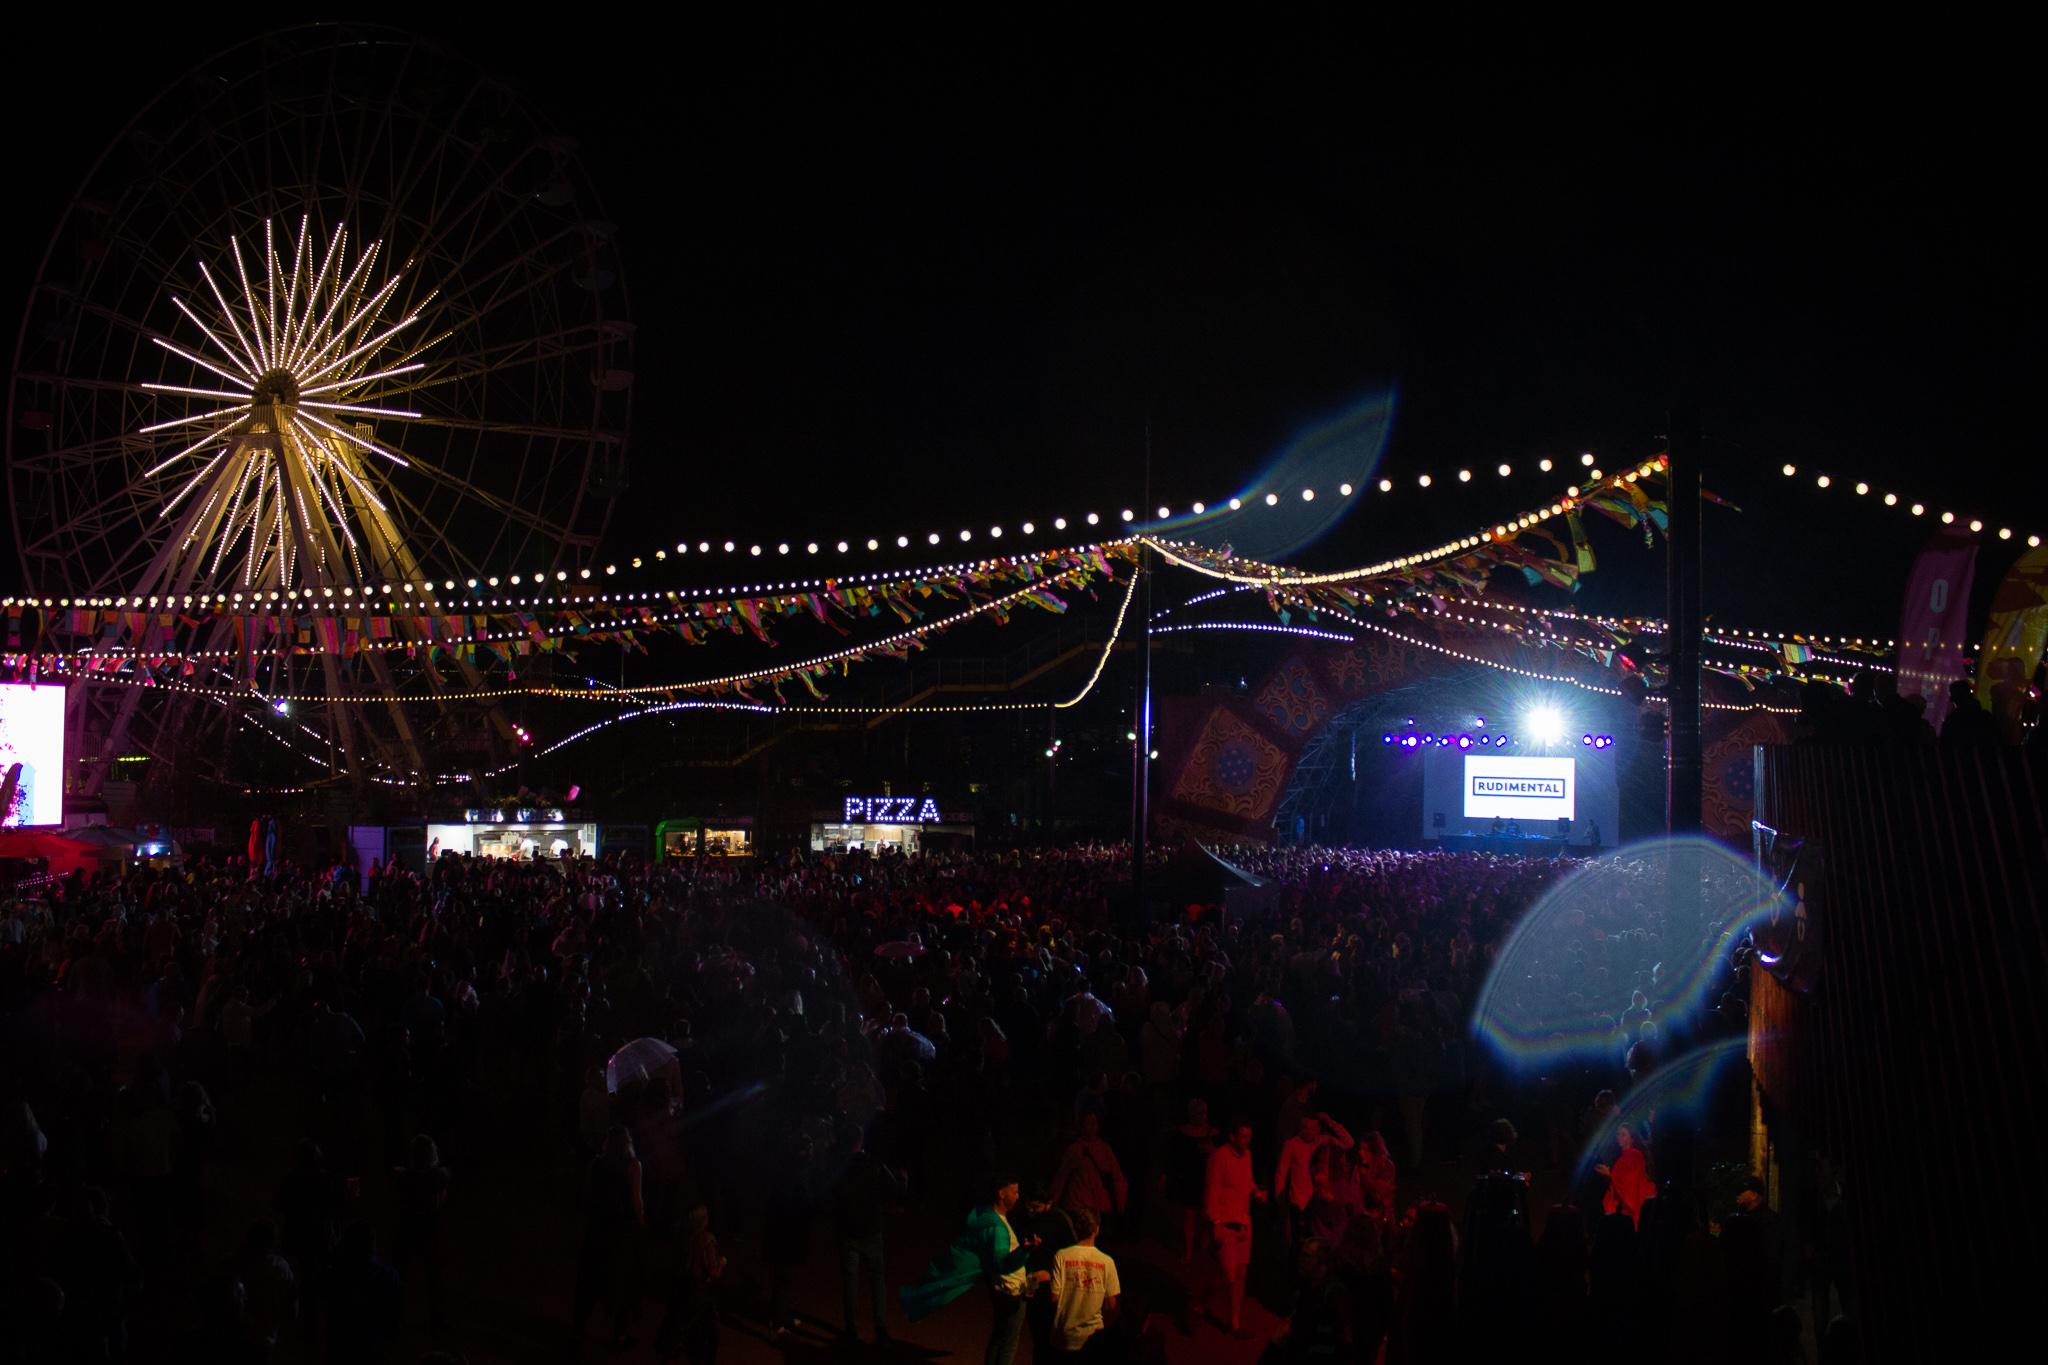 fair ground at night